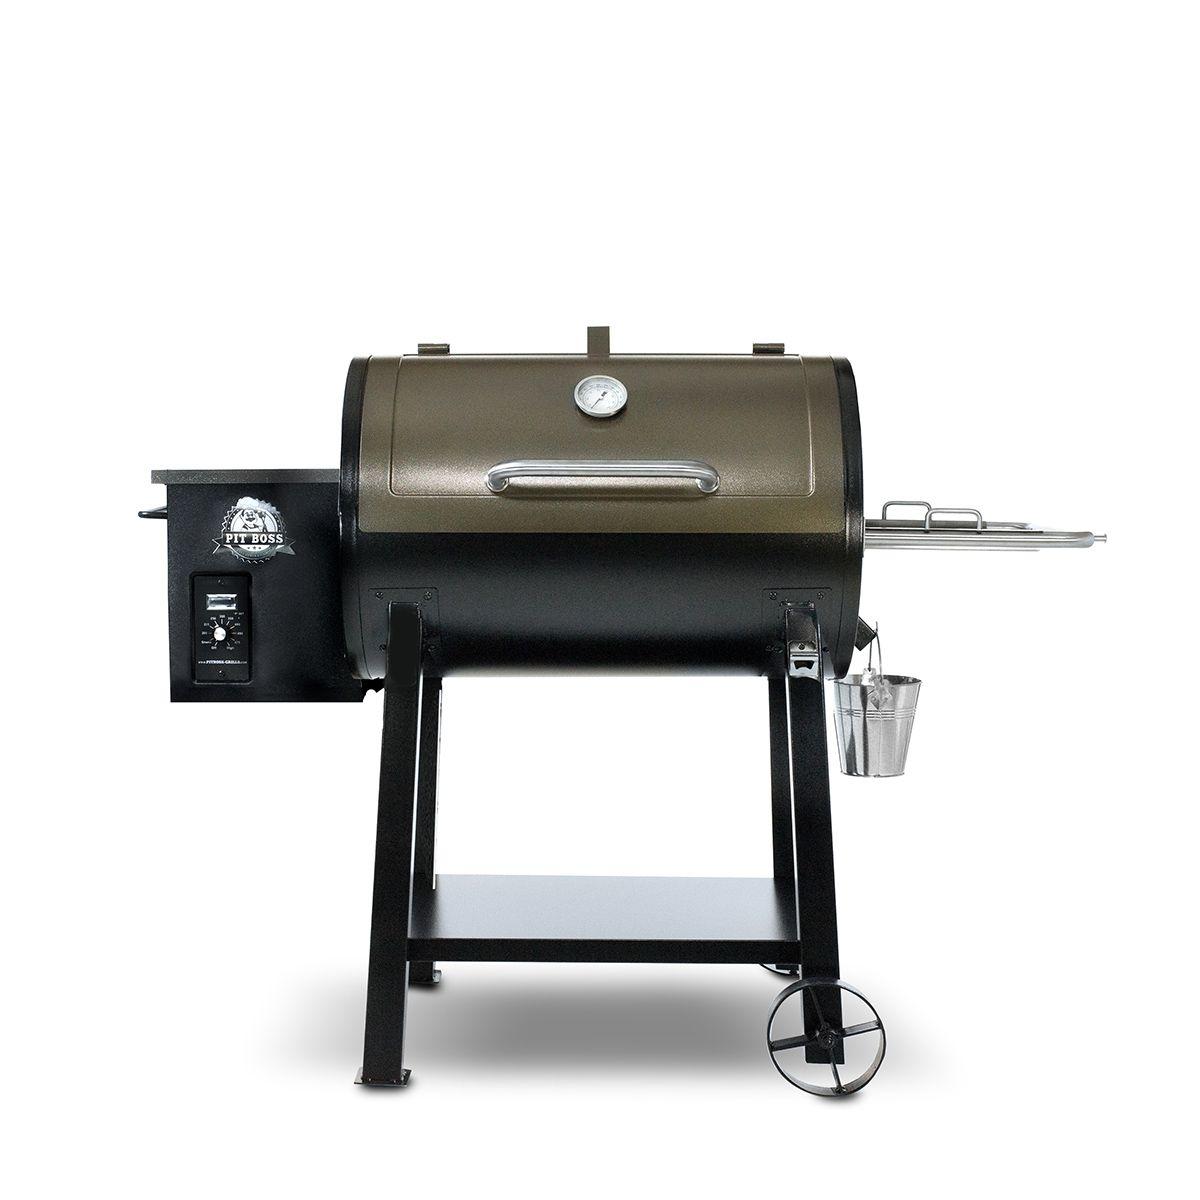 PB 440 Deluxe | Wood pellets, Pellet grill, Wood pellet grills